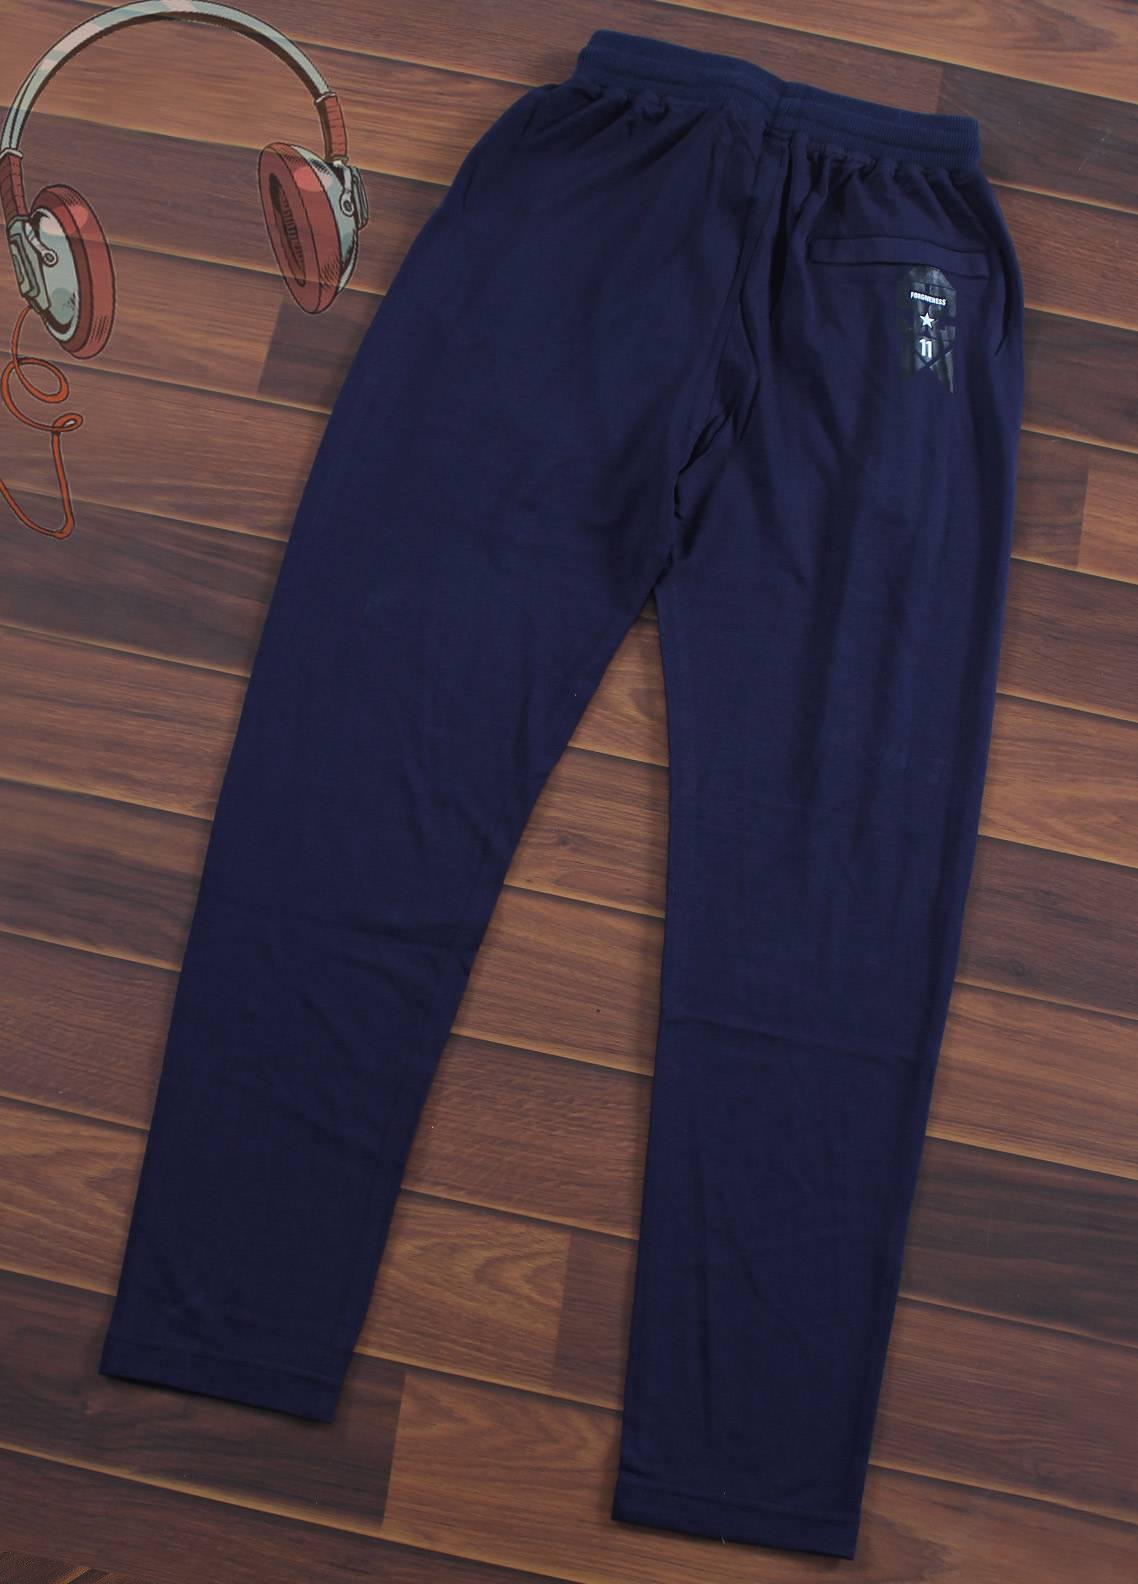 Sanaulla Exclusive Range Jersey Casual Boys Trousers -  7001-Blue